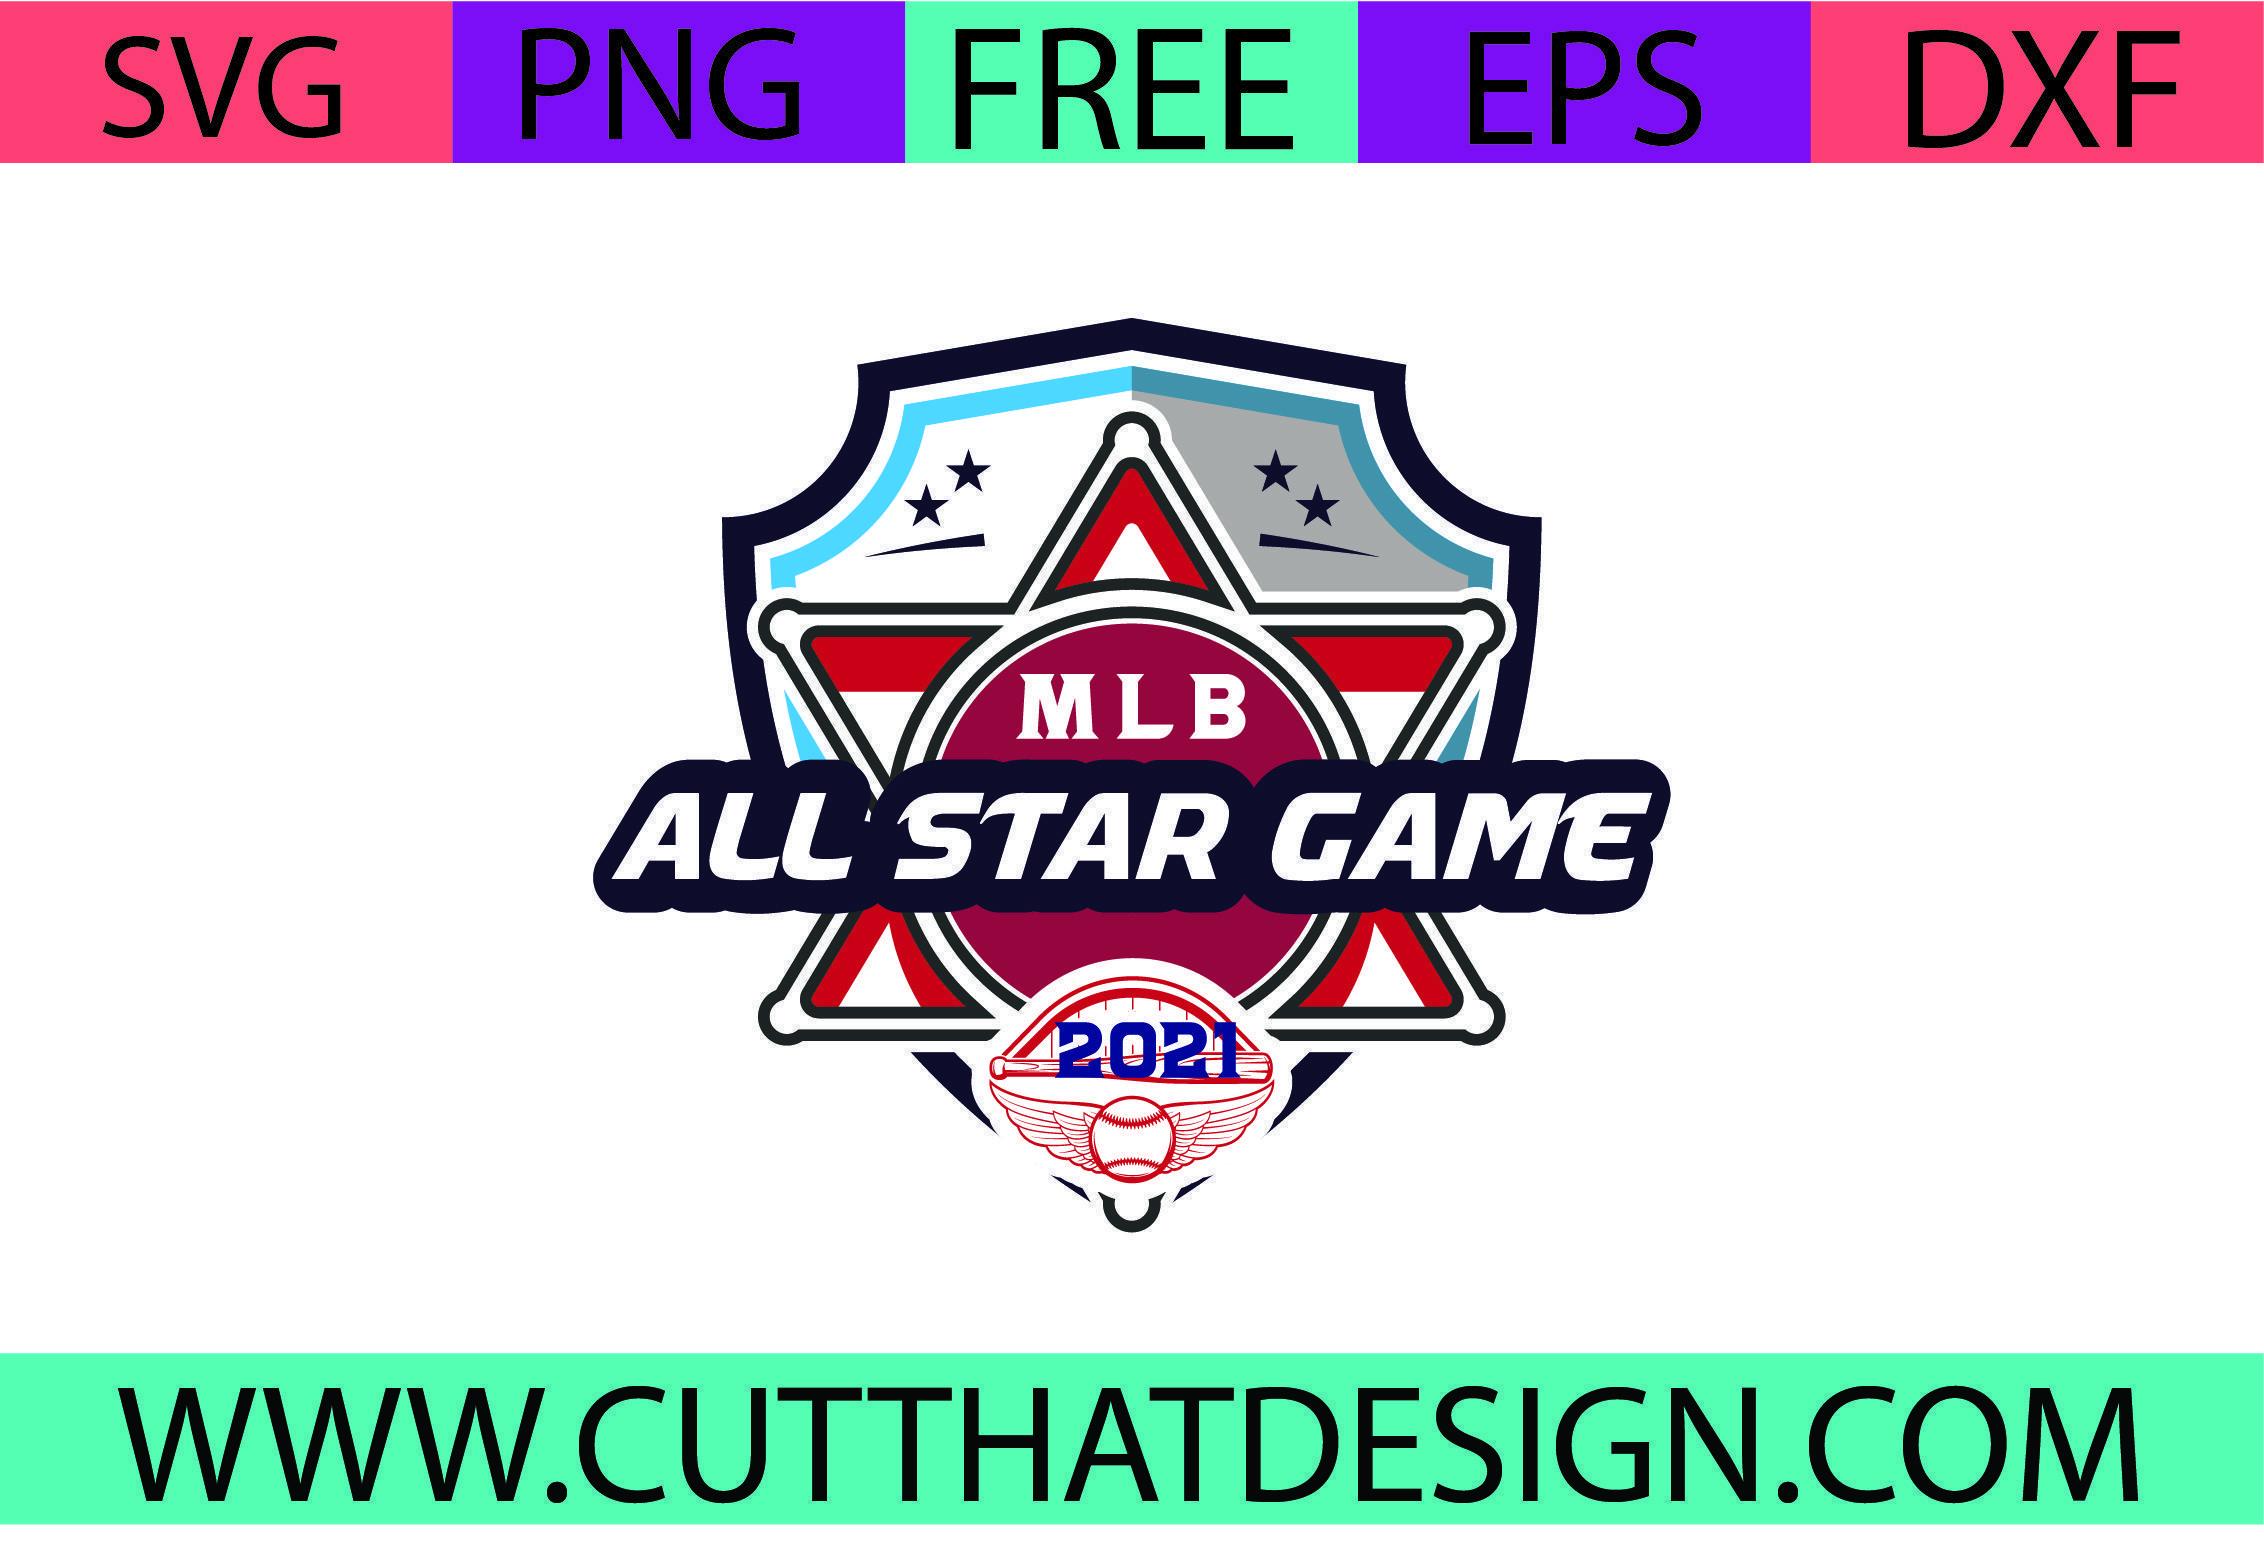 Free World Sports Events SVG